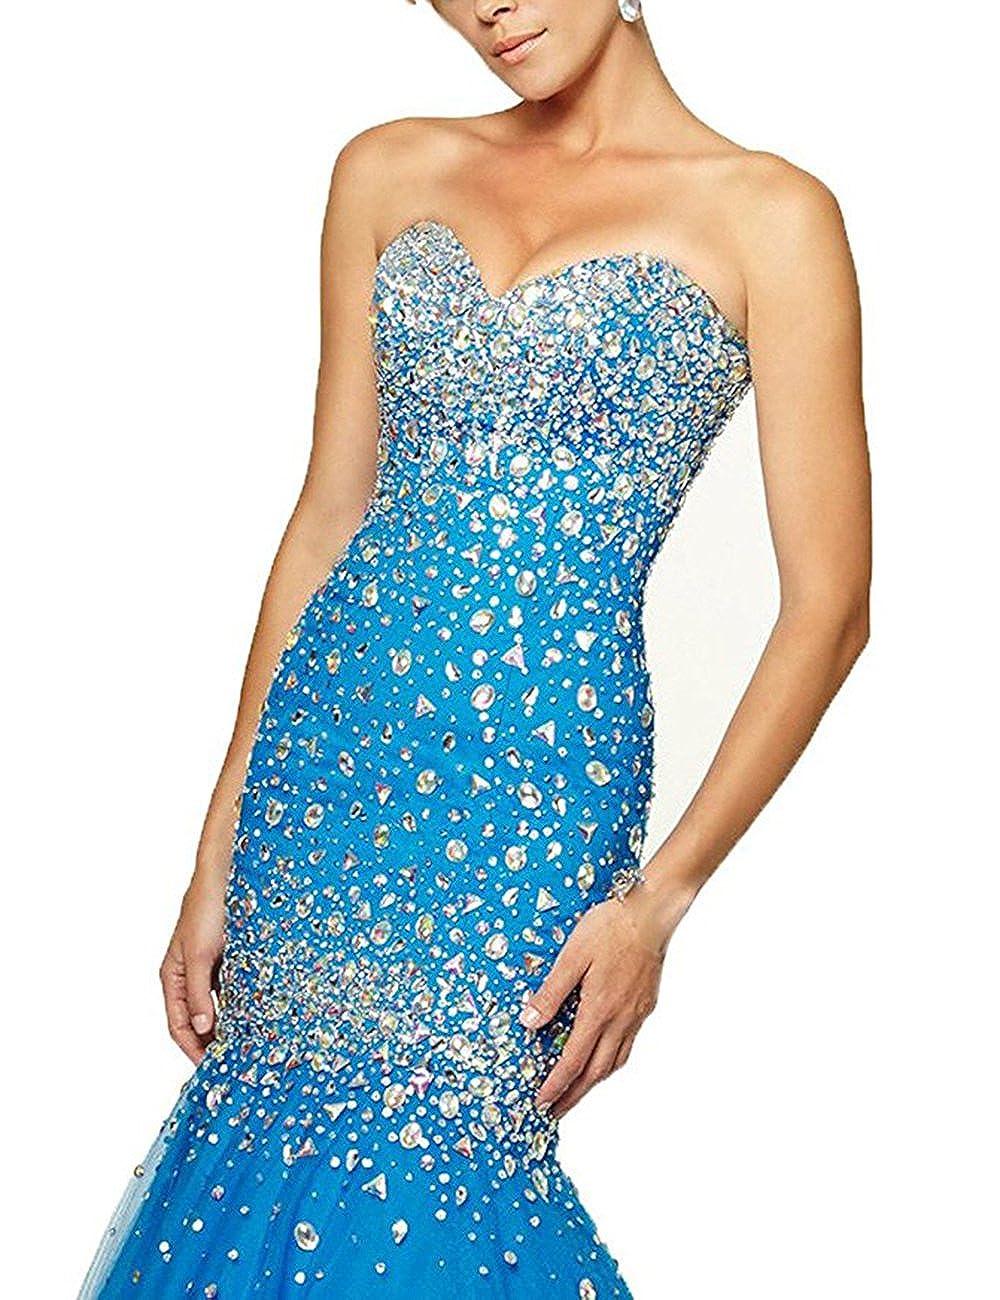 bluee 2 Beautydress Luxury Beaded Lace Up Sweetheart Mermaid Prom Dresses for Women BP116